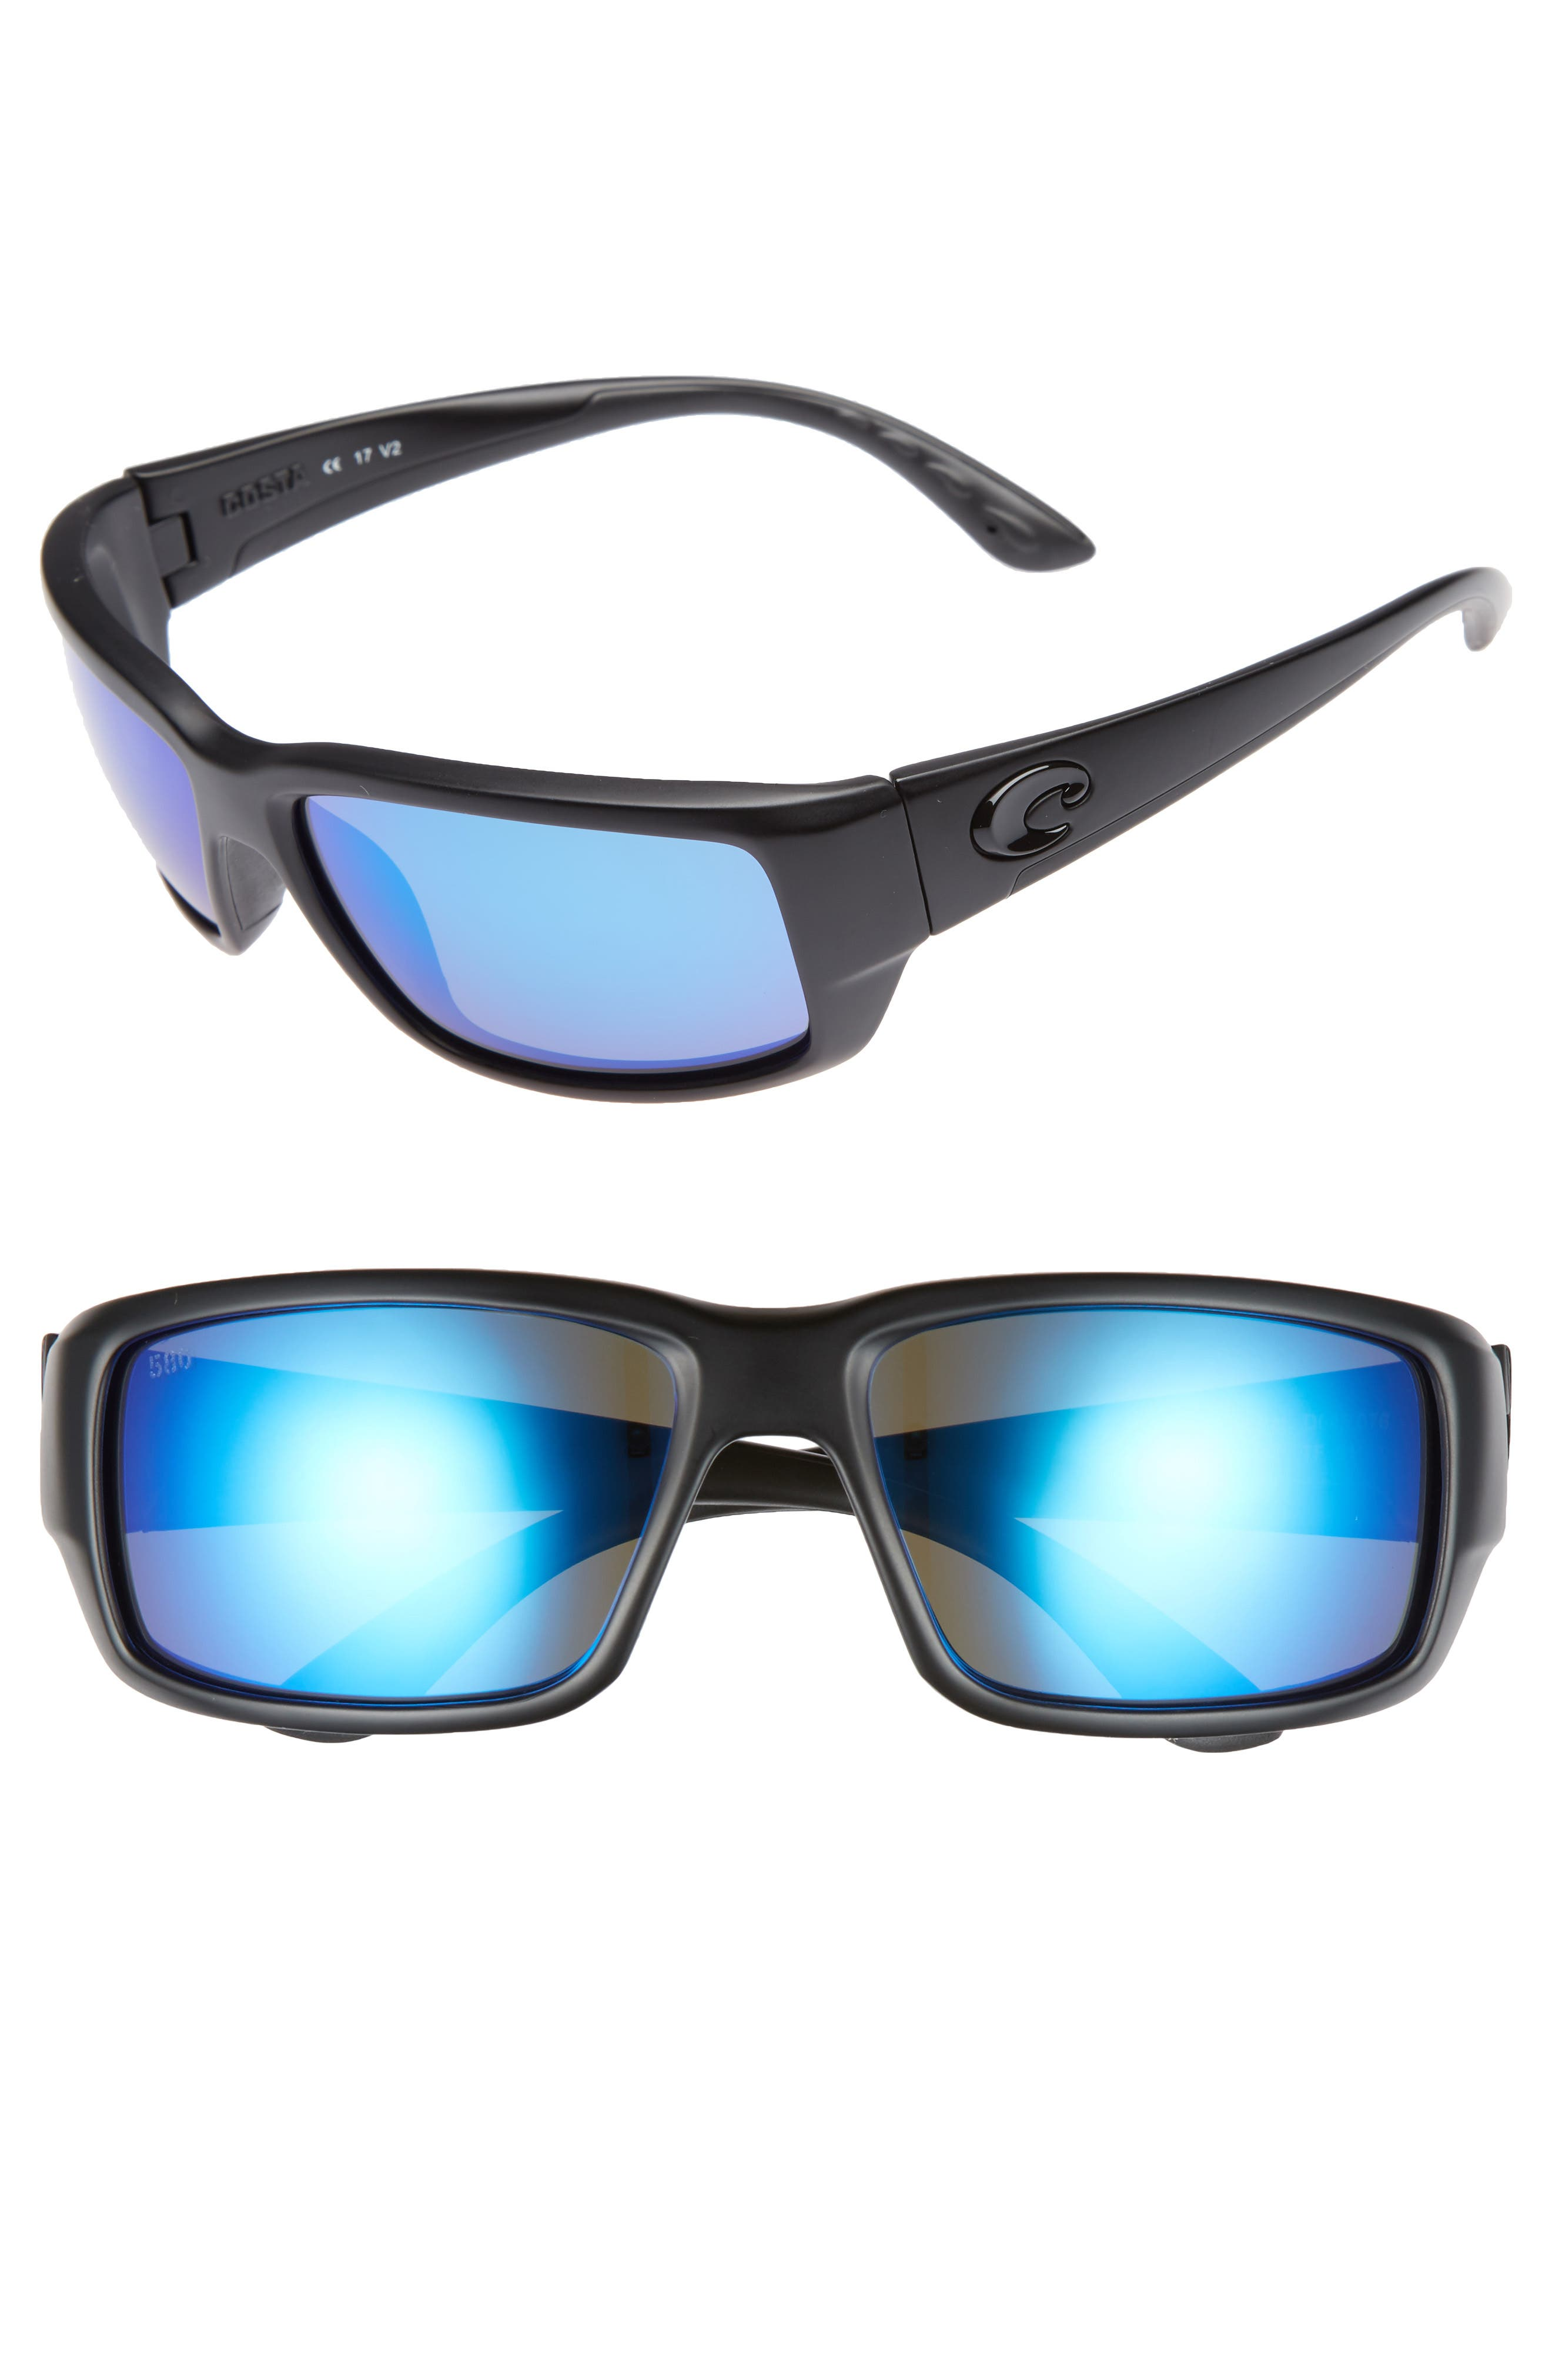 Fantail 60mm Polarized Sunglasses,                             Main thumbnail 1, color,                             BLACKOUT/ BLUE MIRROR